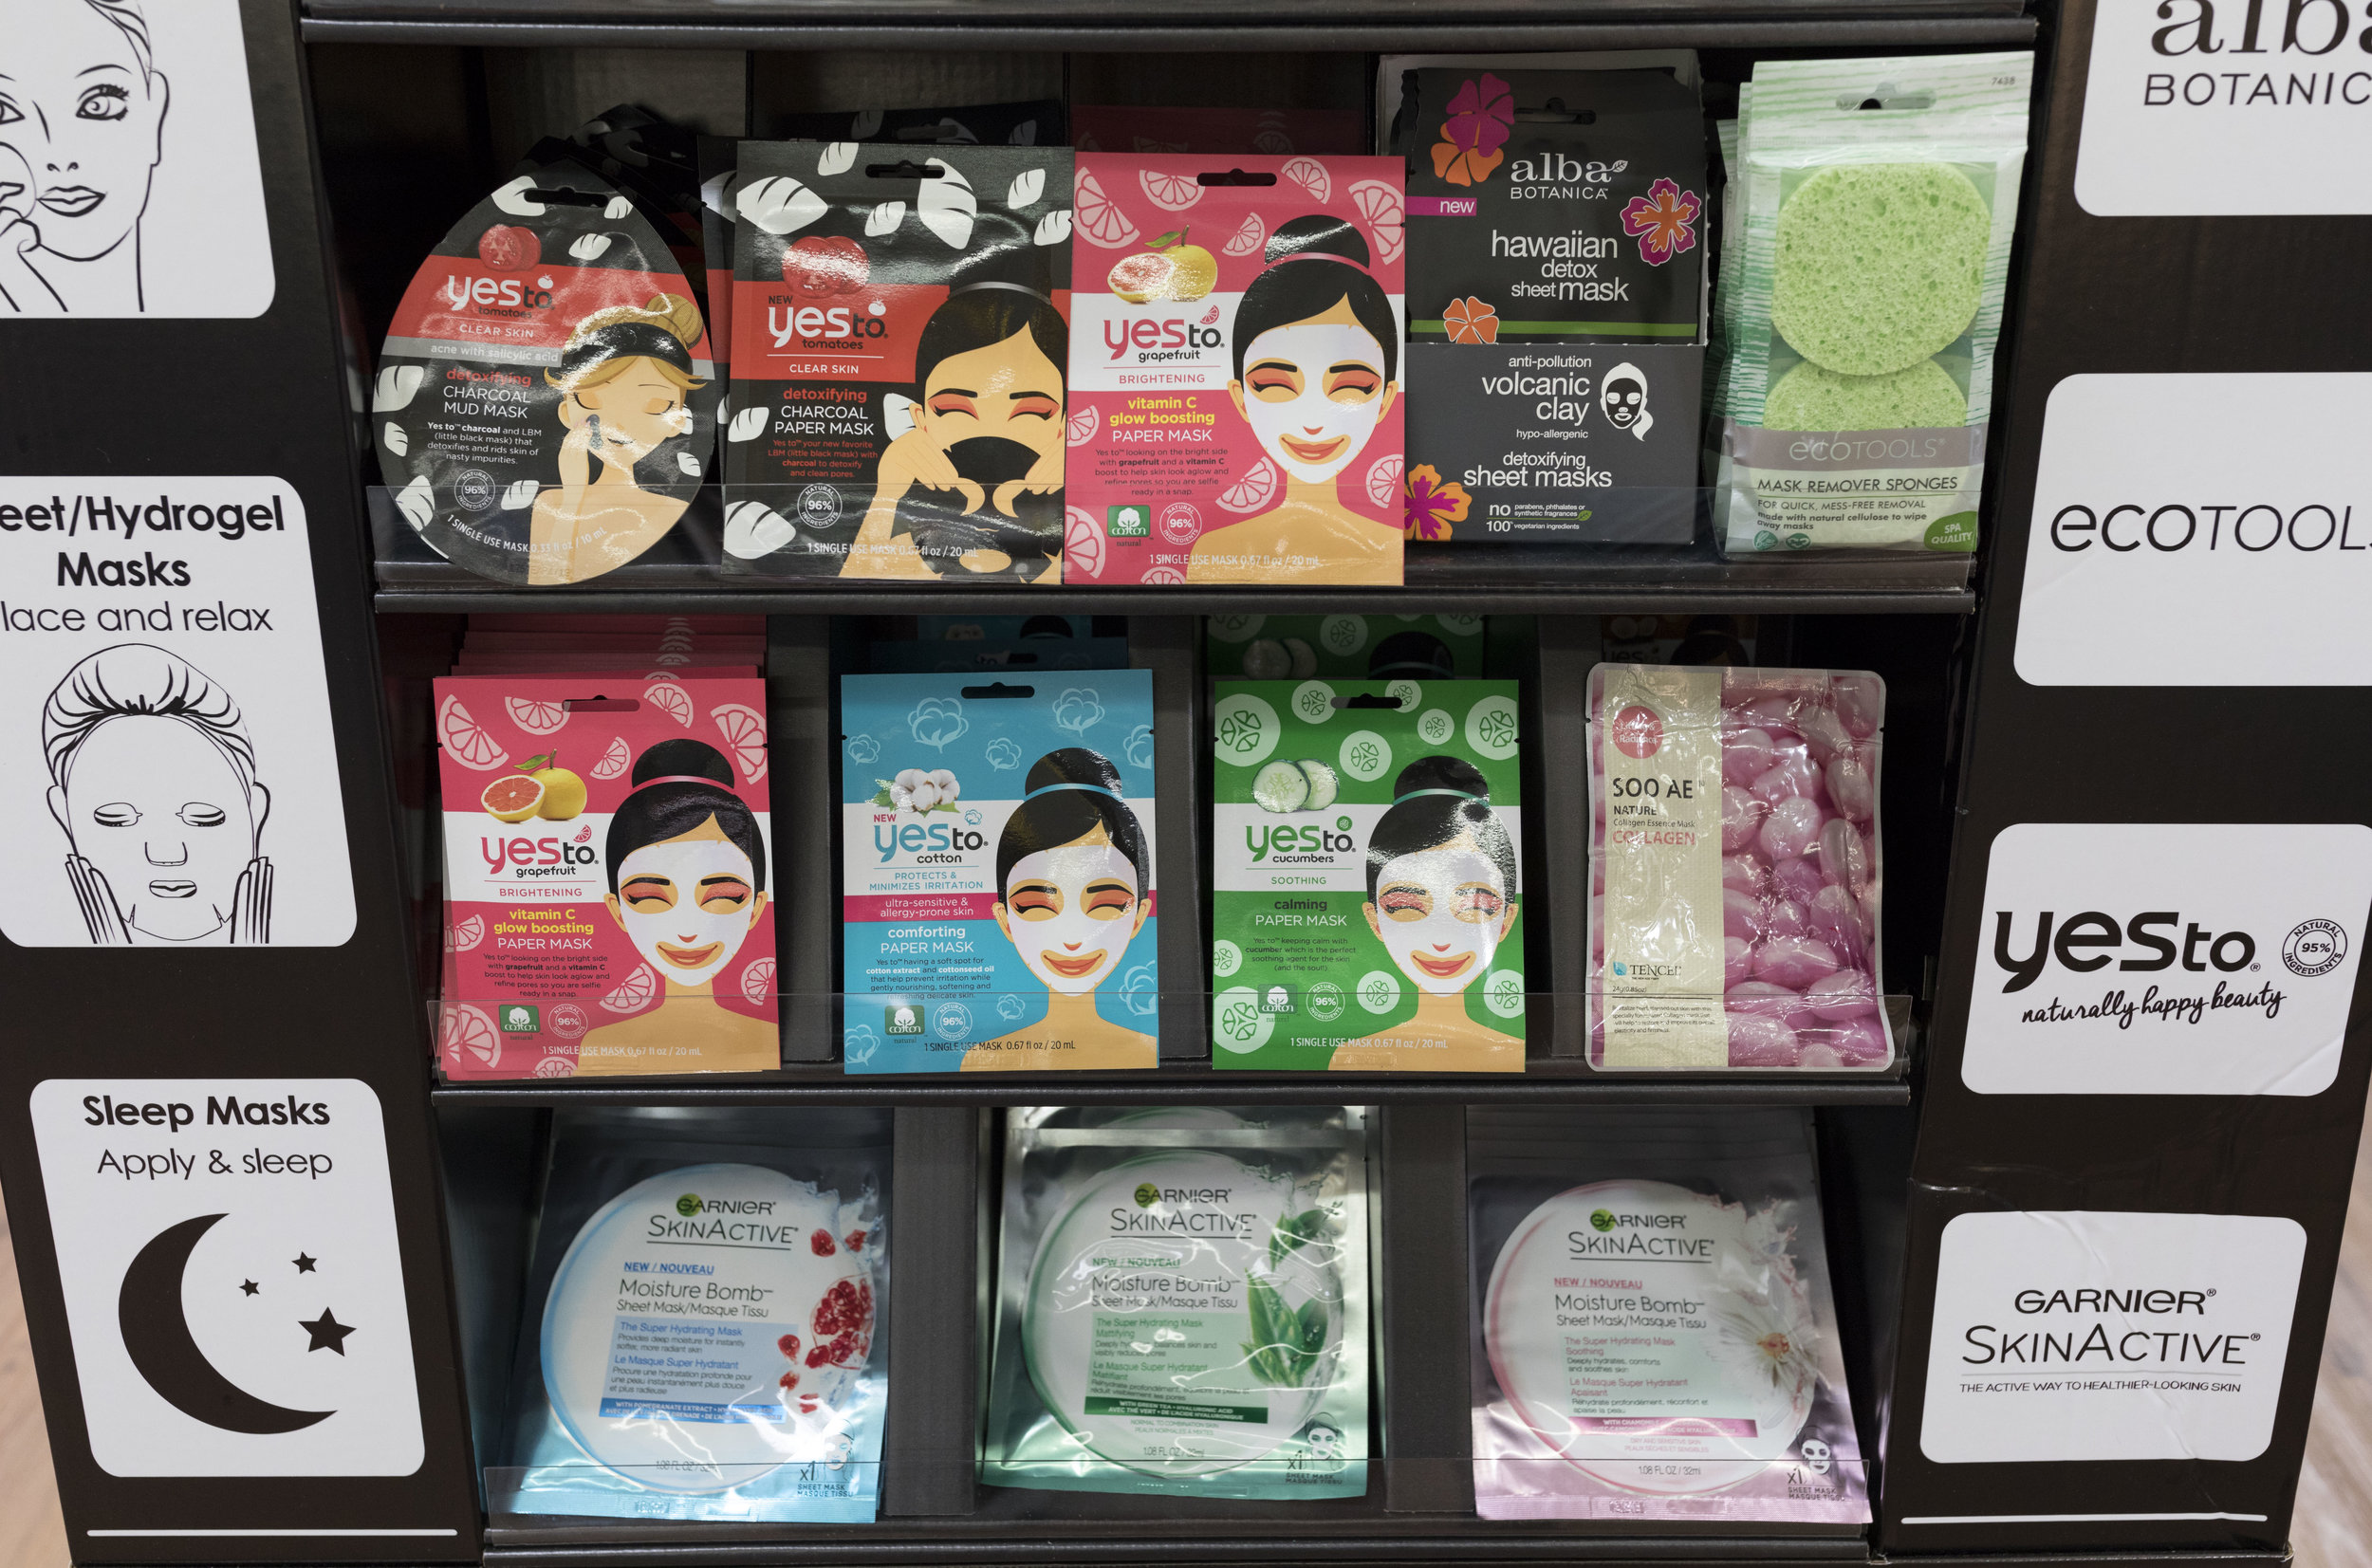 Walmart Fall Beauty Preview x Krity S x Face Masks